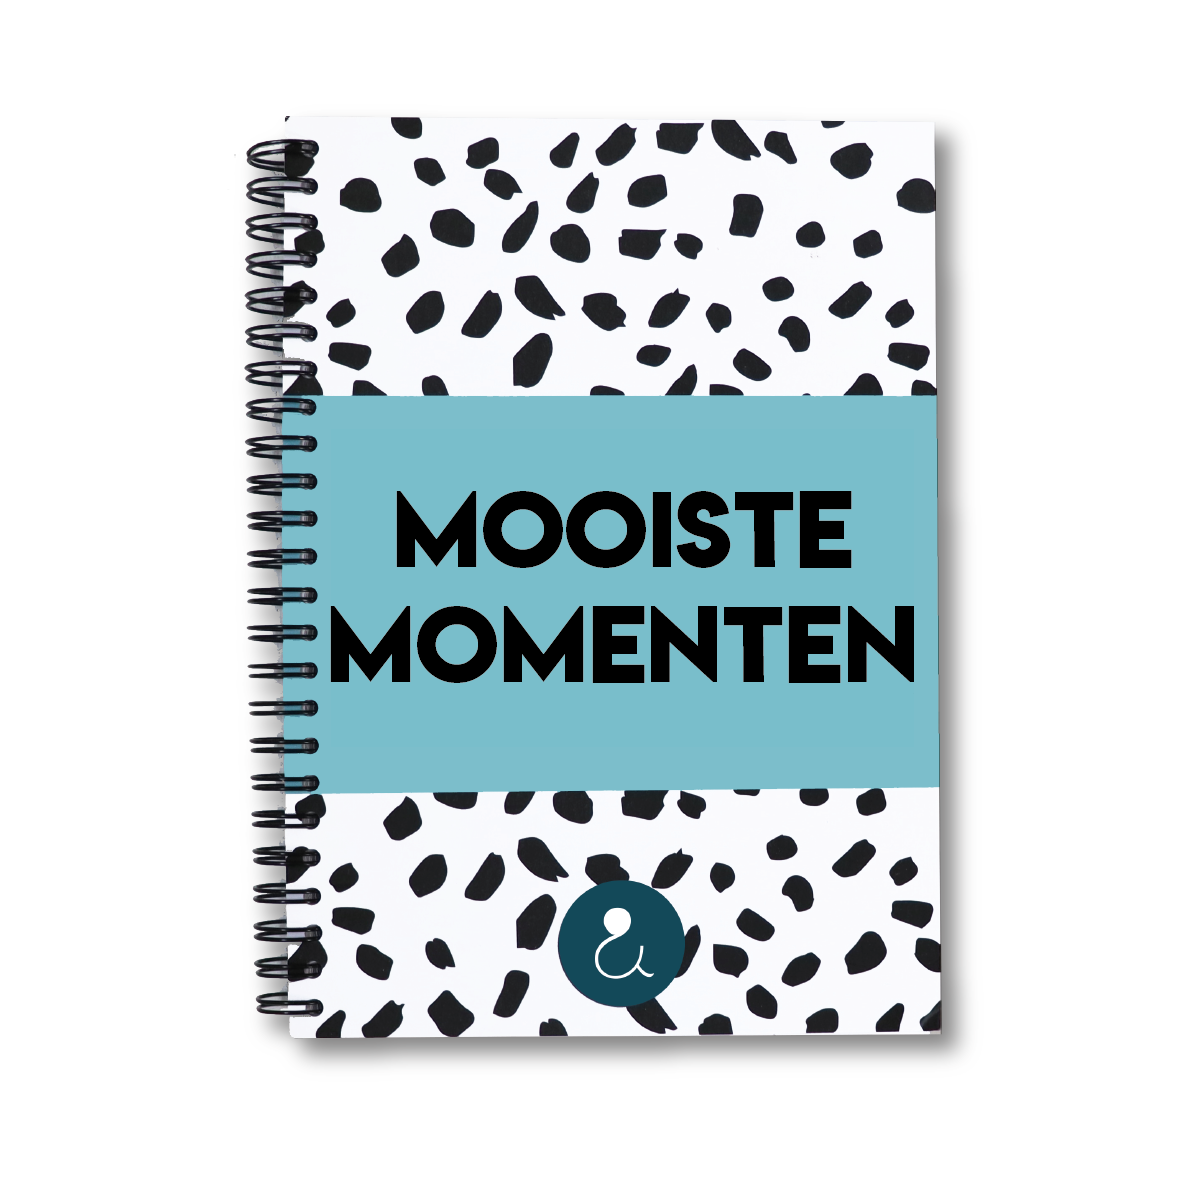 Mooiste momenten plakboek a5 | lichtblauw